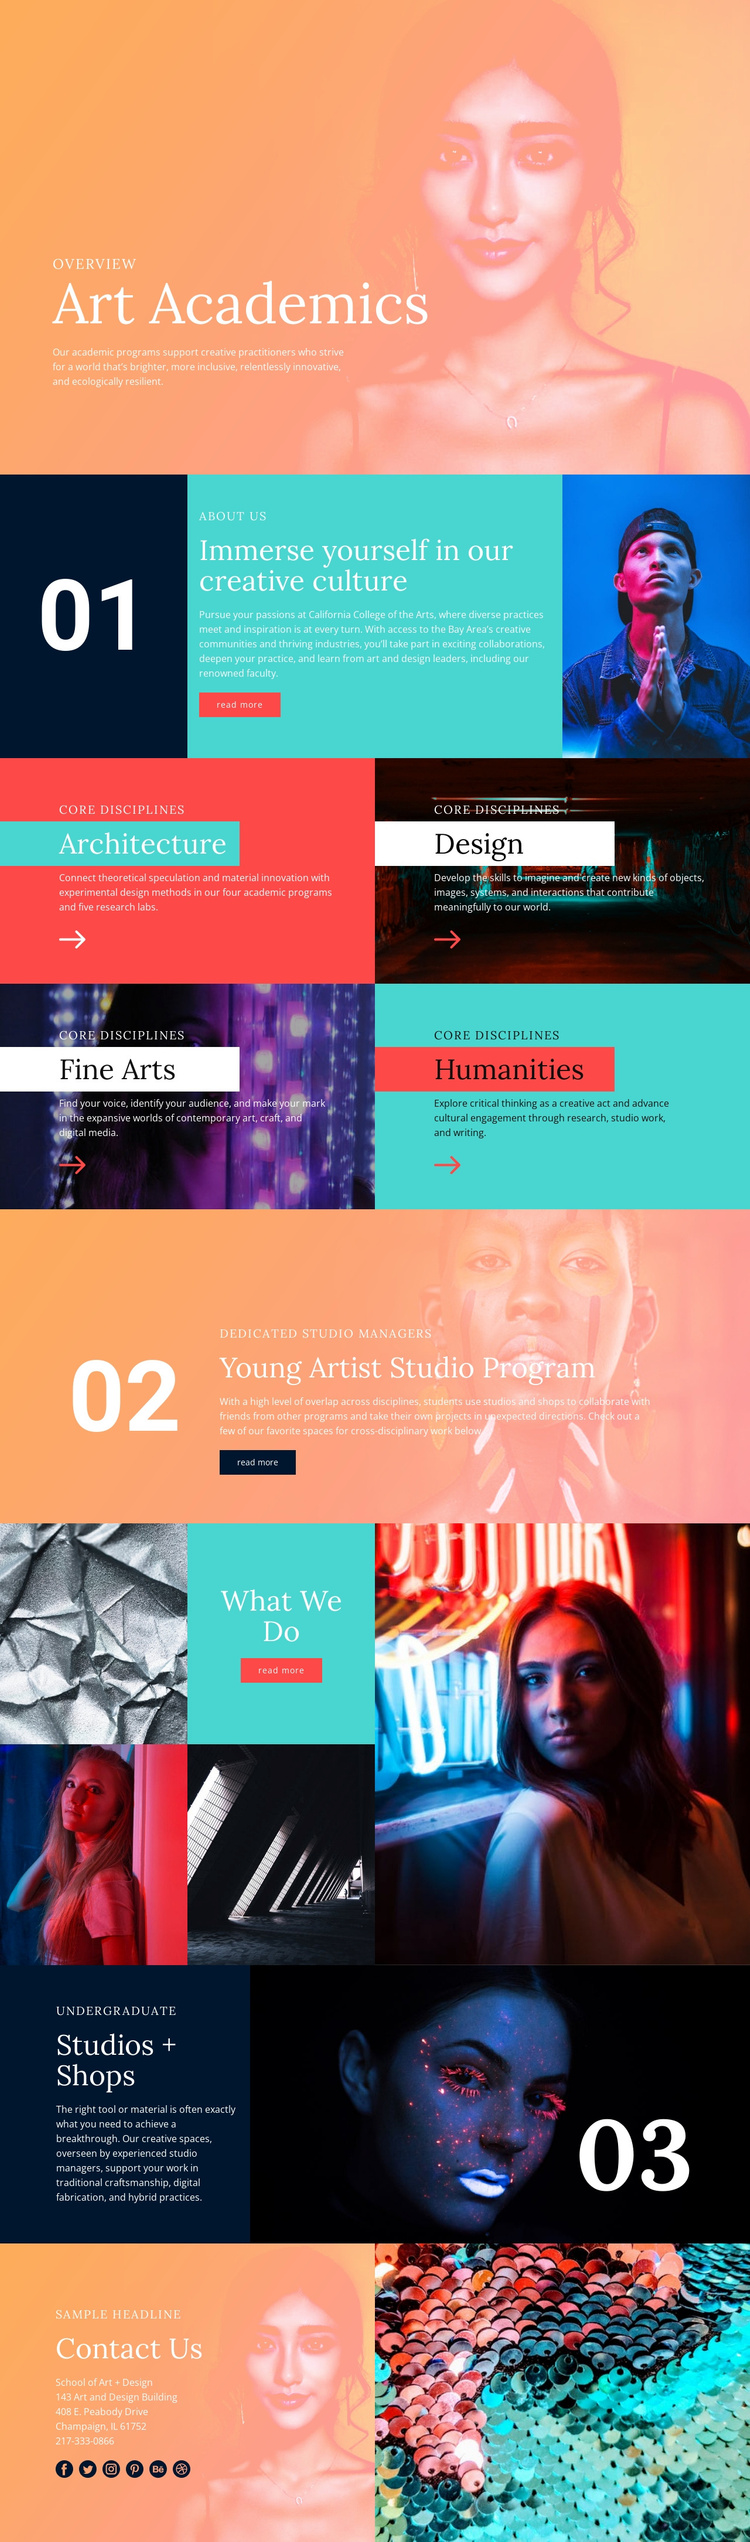 Creative culture in school Joomla Template